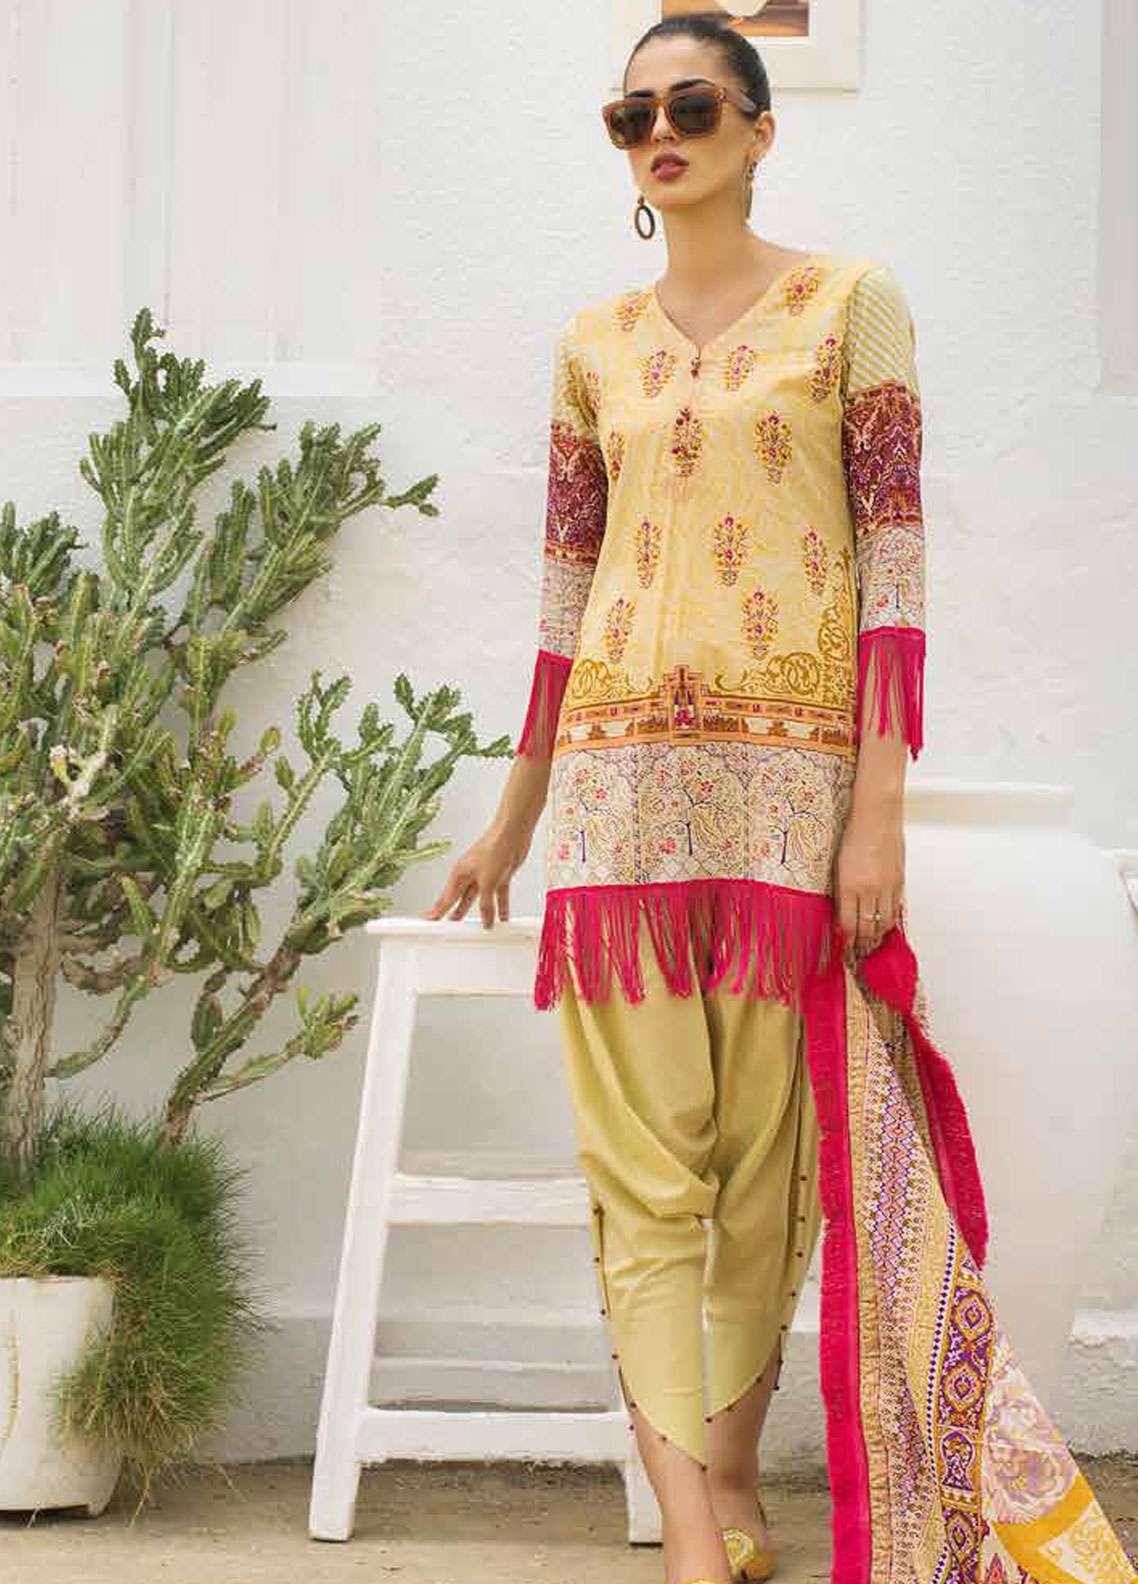 Al Zohaib Printed Lawn Unstitched 3 Piece Suit AZC19L 6A - Spring / Summer Collection